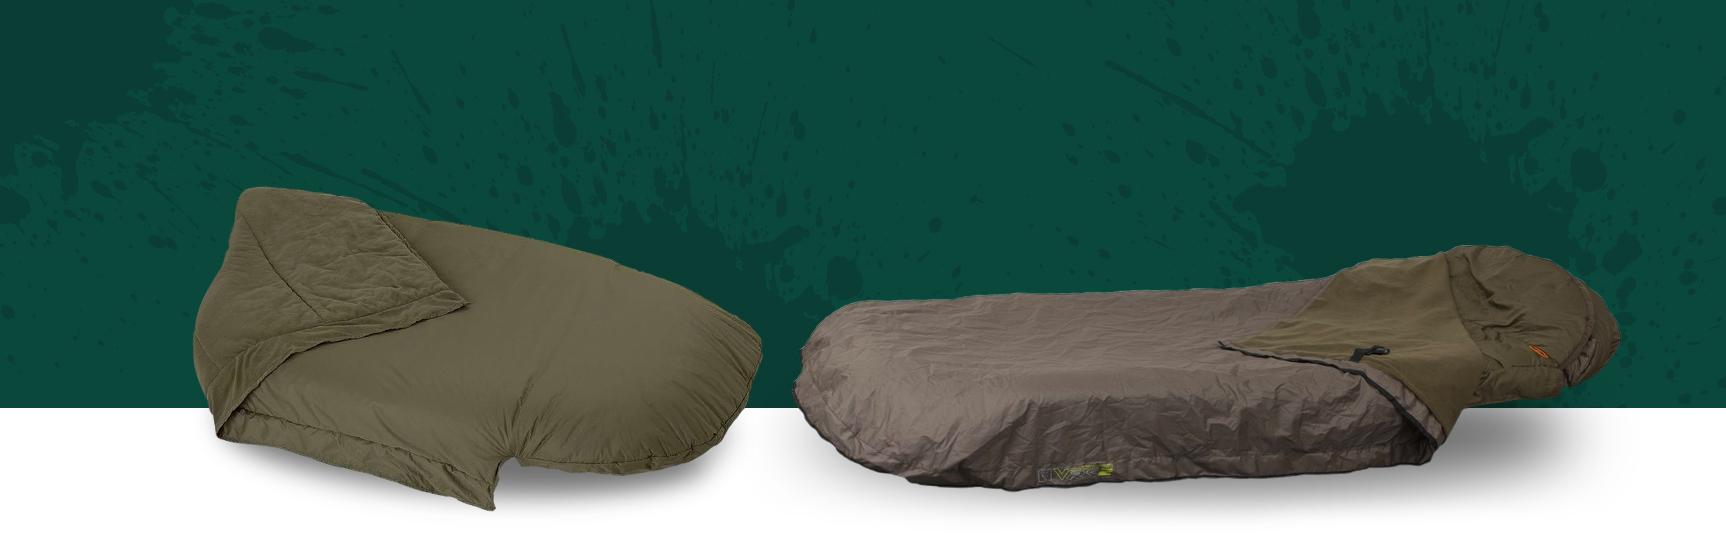 Bedchair Covers